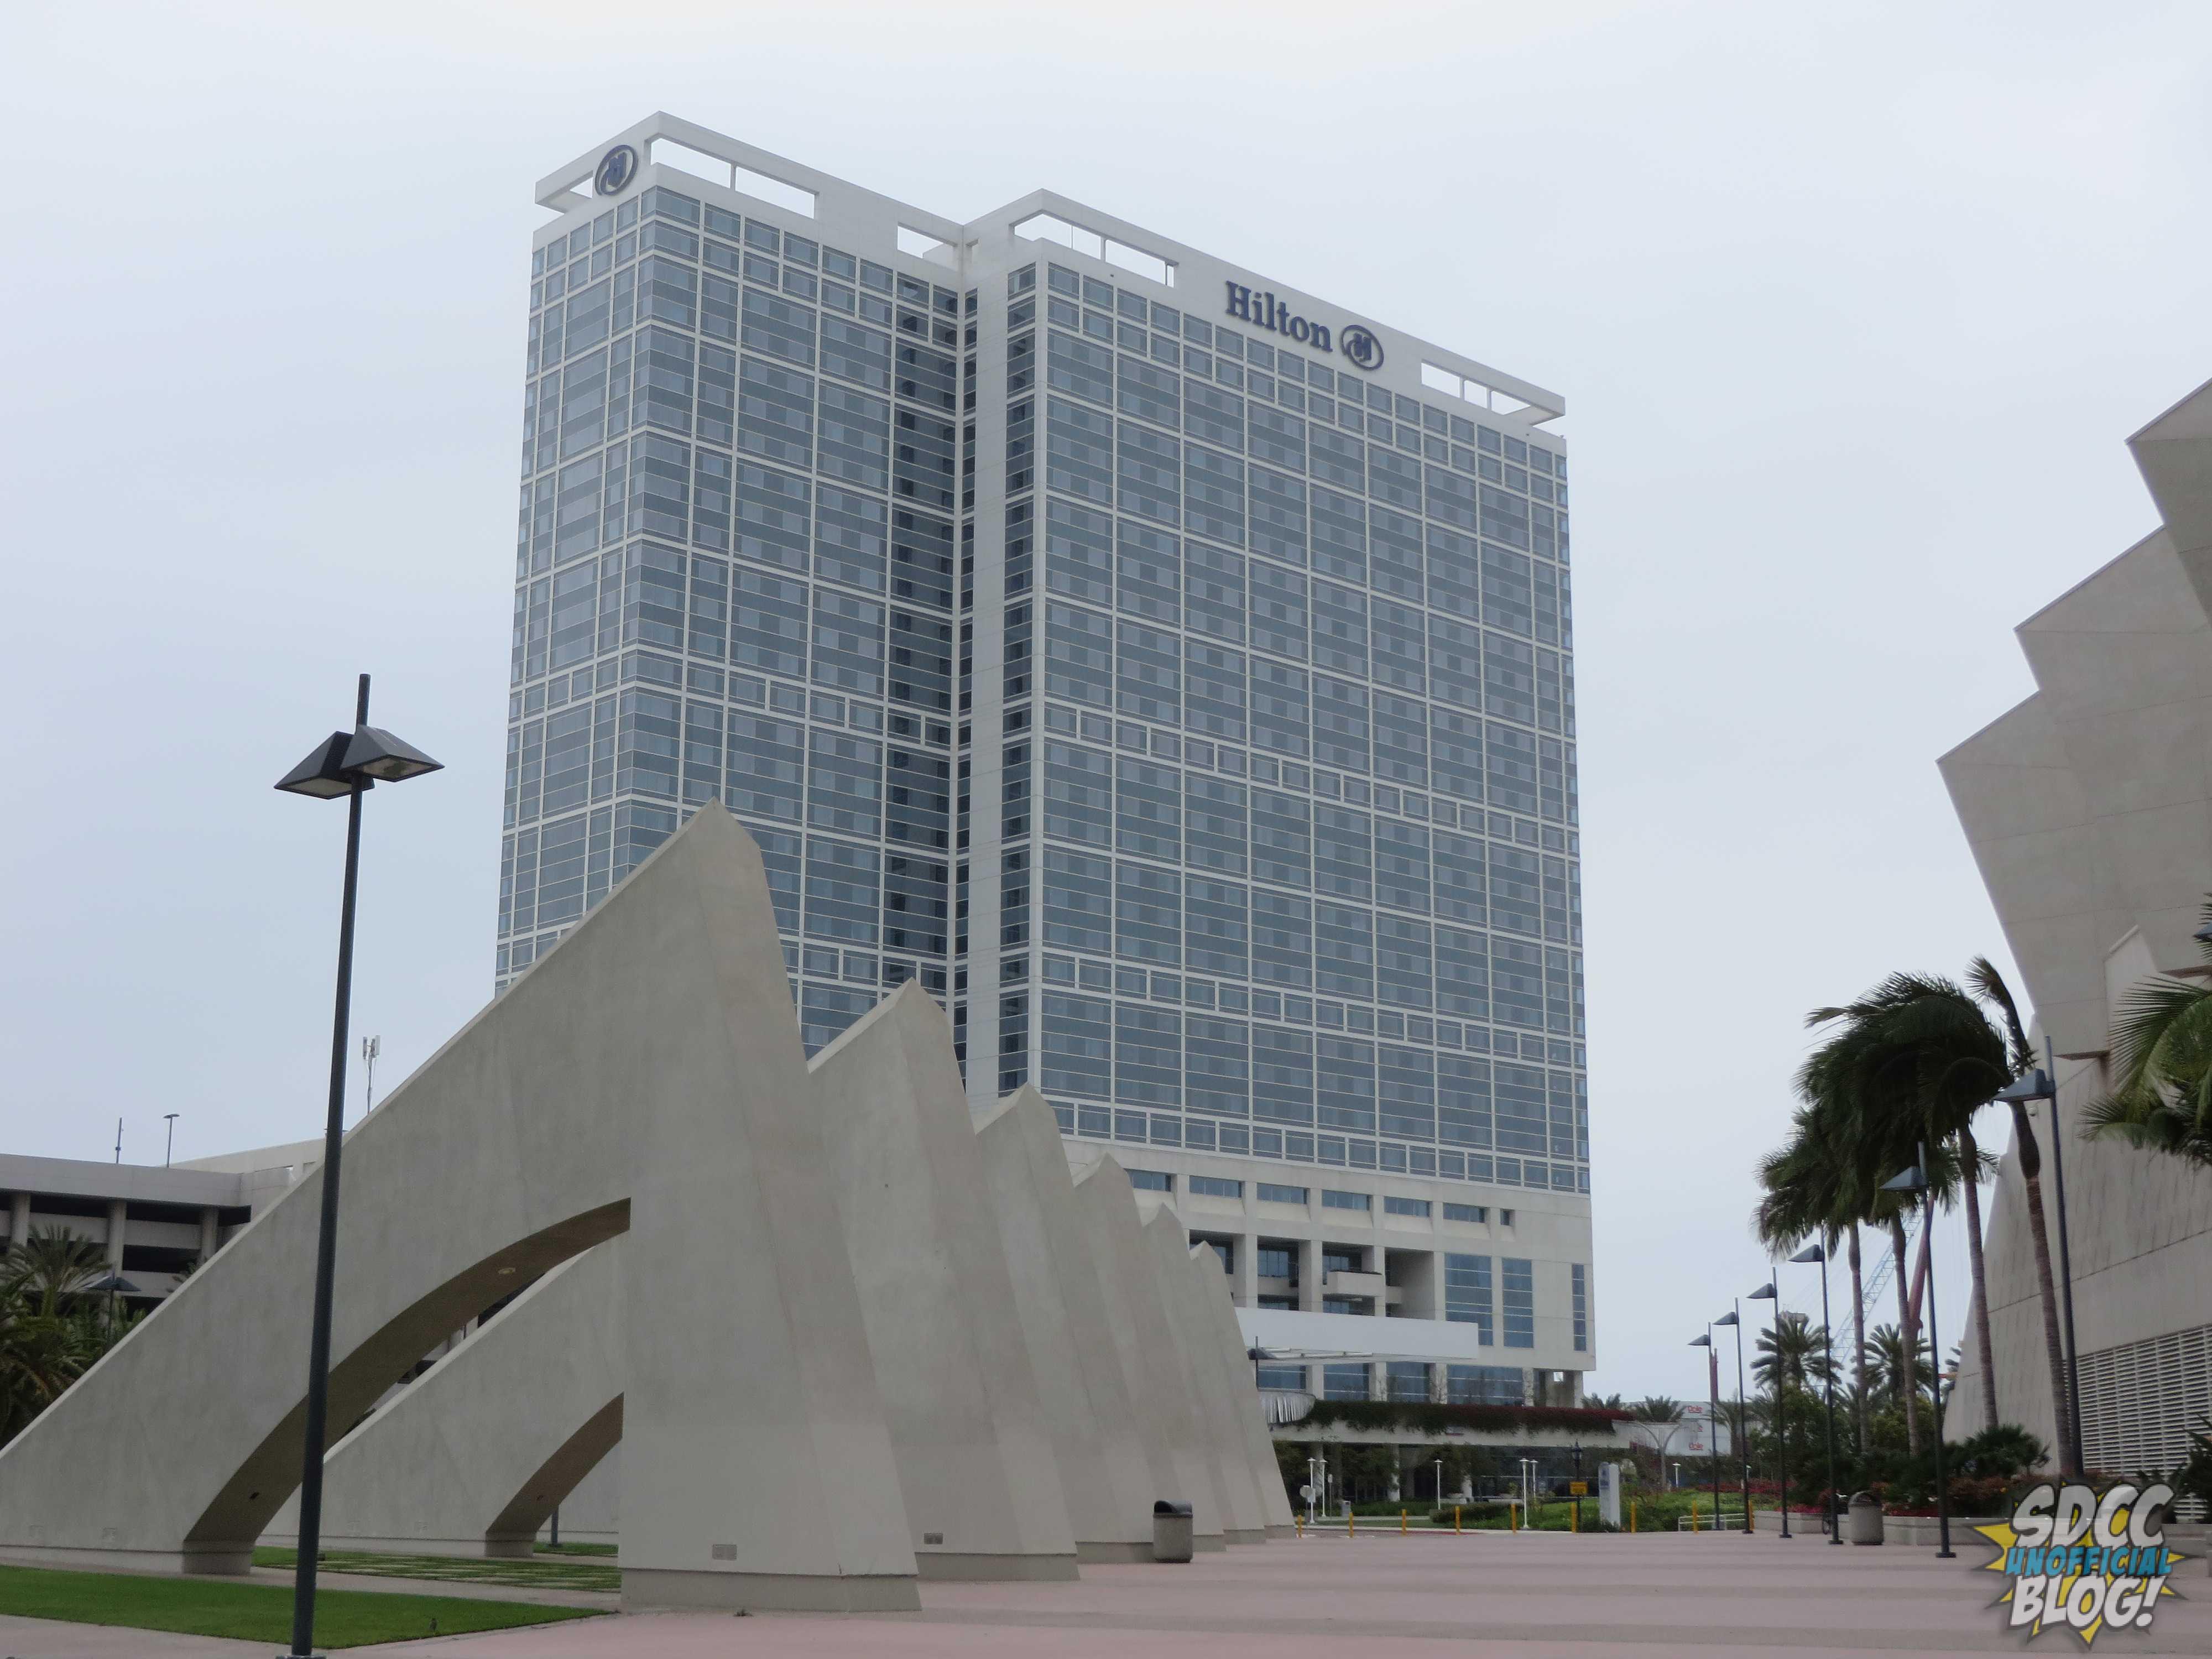 hilton bayfront hotel